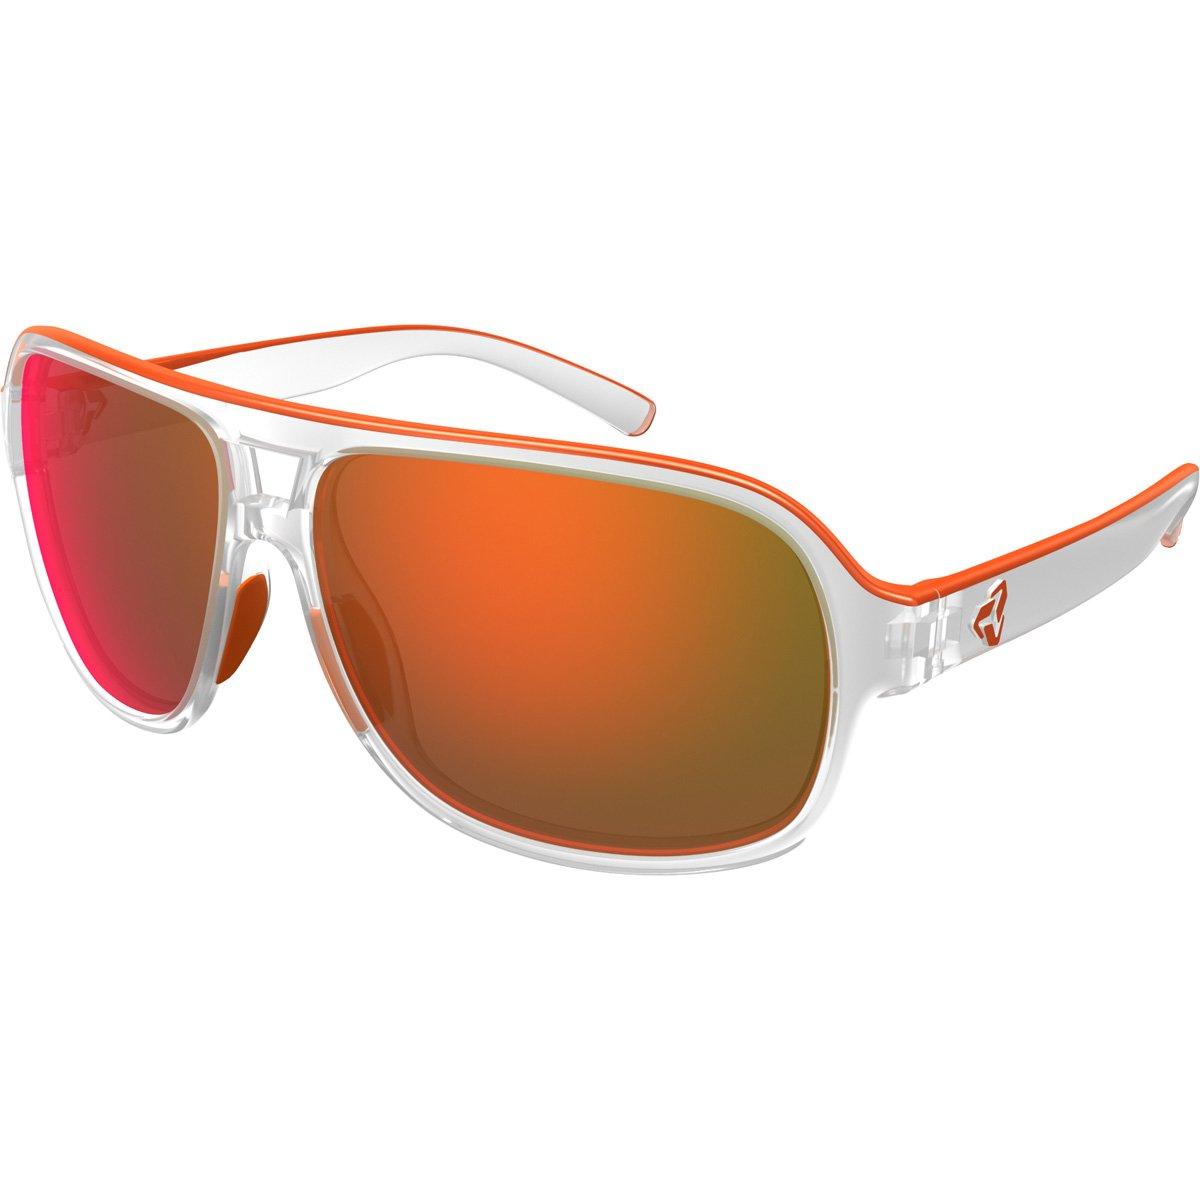 Ryders Eyewear Pint Standard Sunglasses 2-Tone CAMO 60 mm R01611C